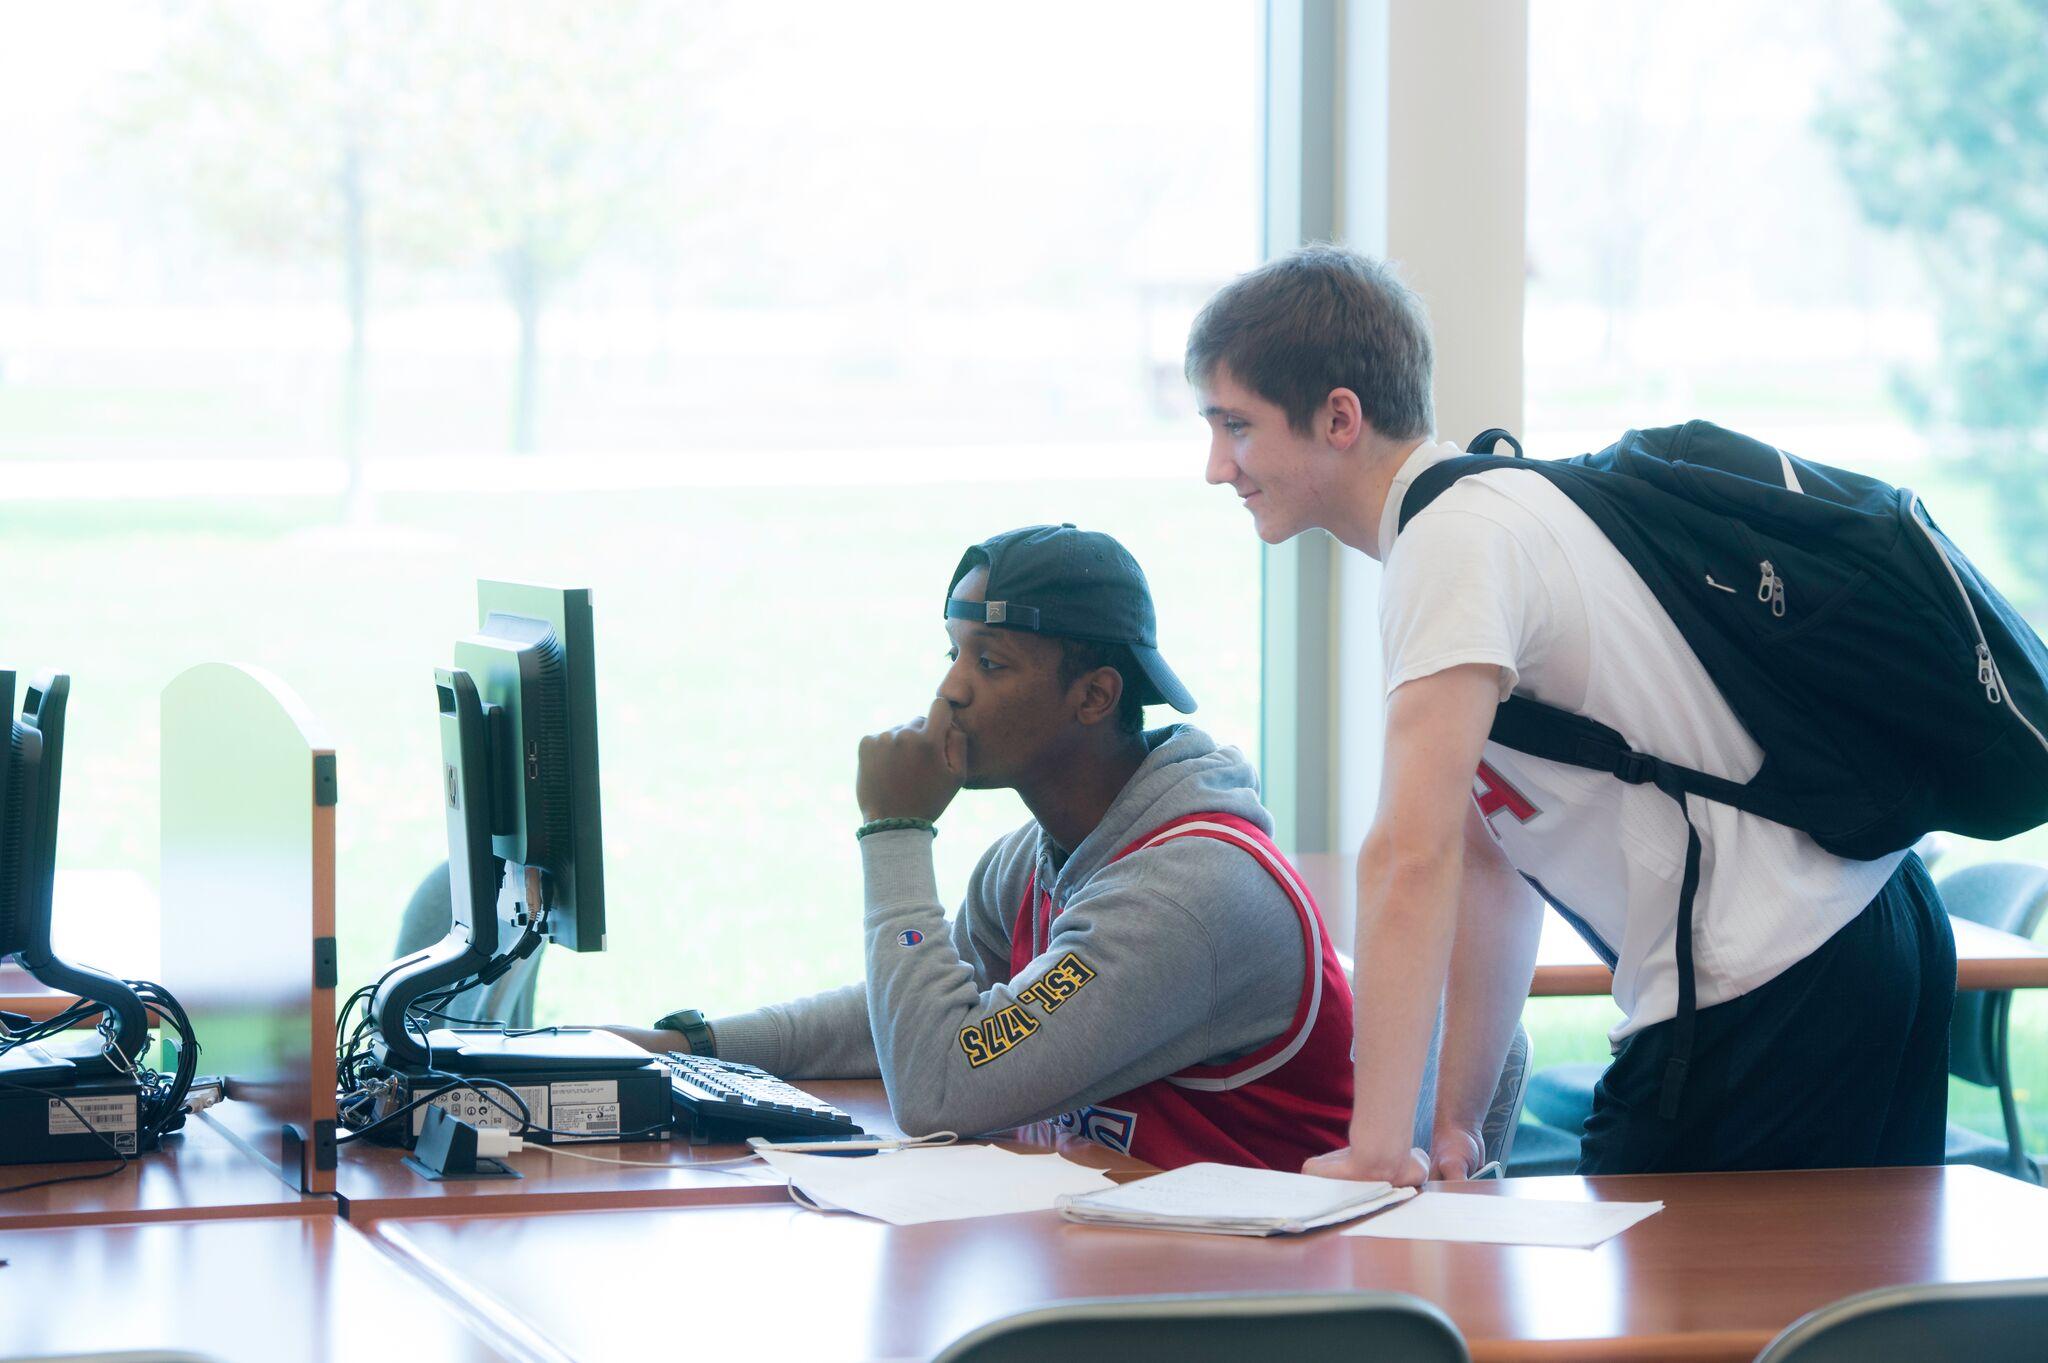 UW-Fond du Lac students